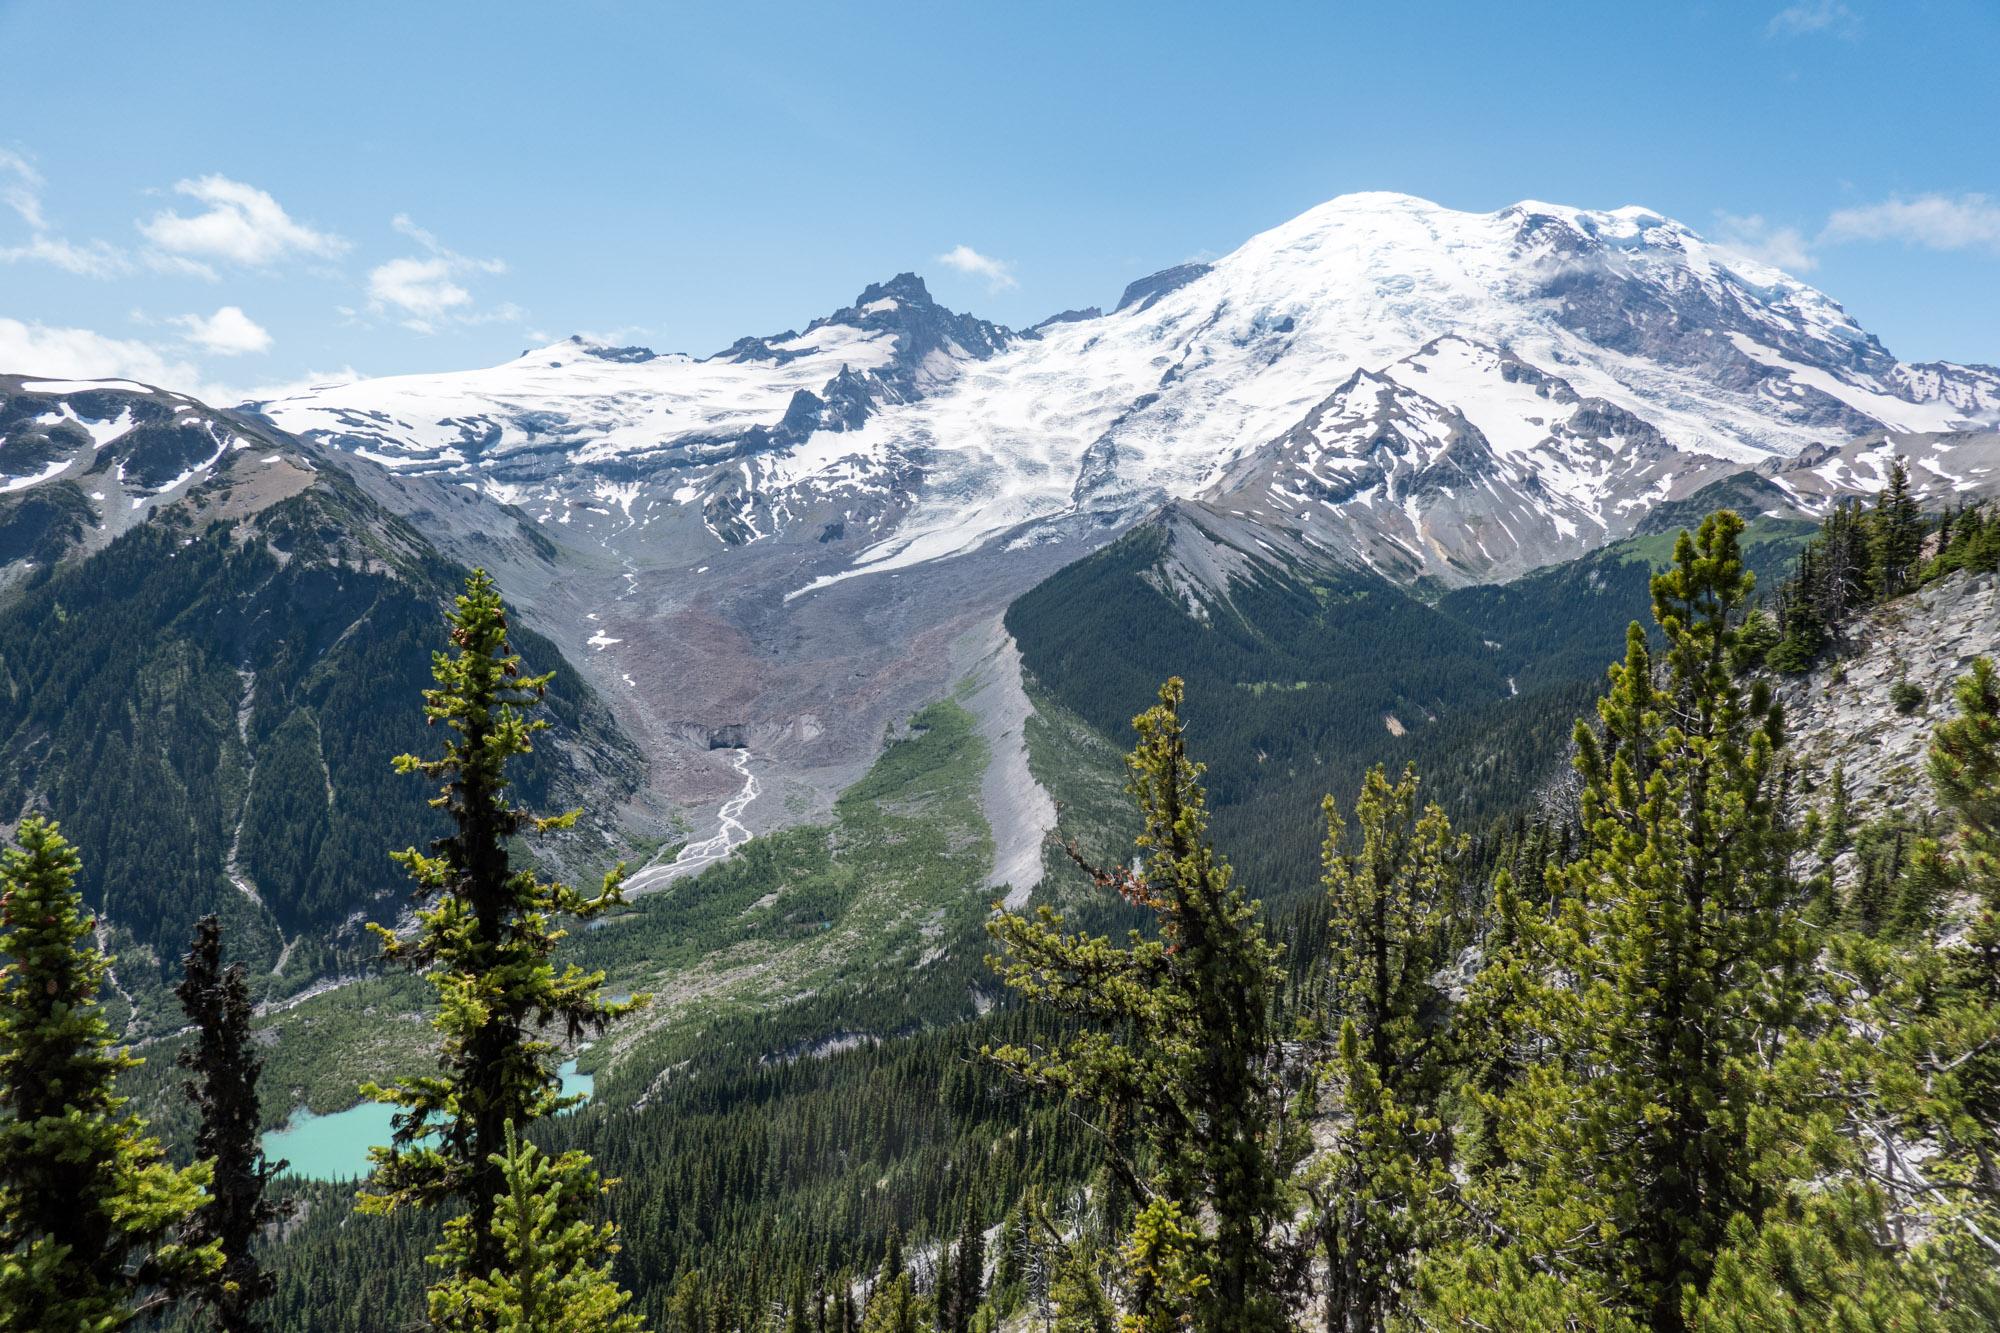 Northeast face of Mt. Ranier from Emmons Vista